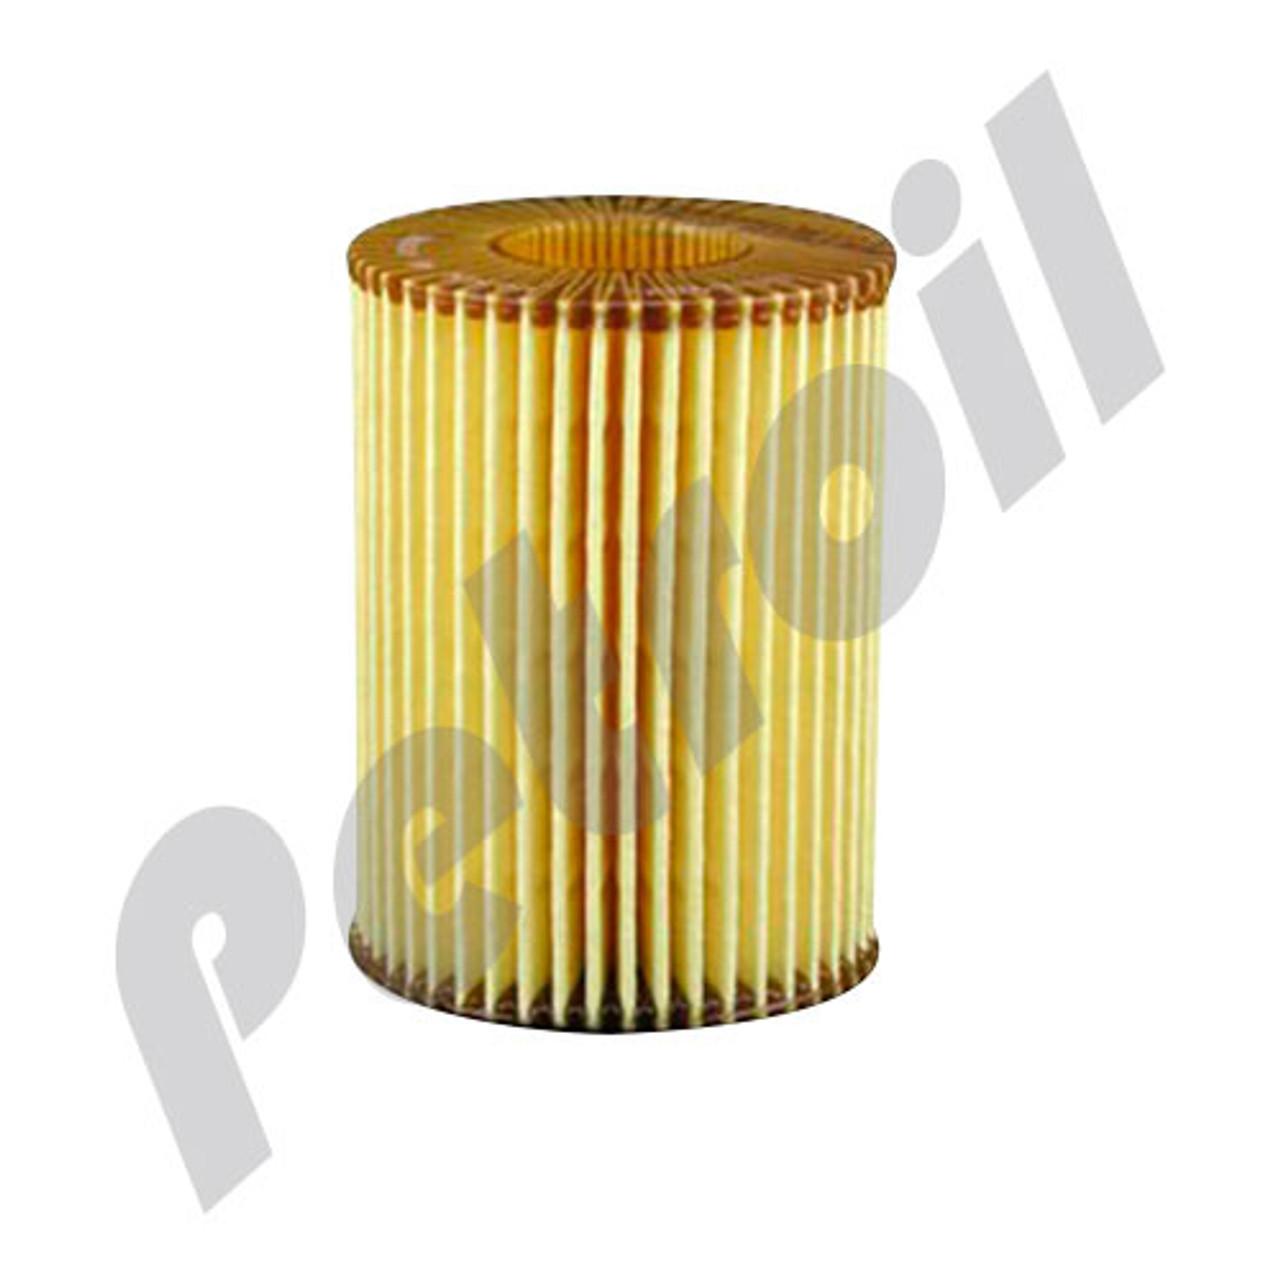 Luber-finer P3969 Oil Filter